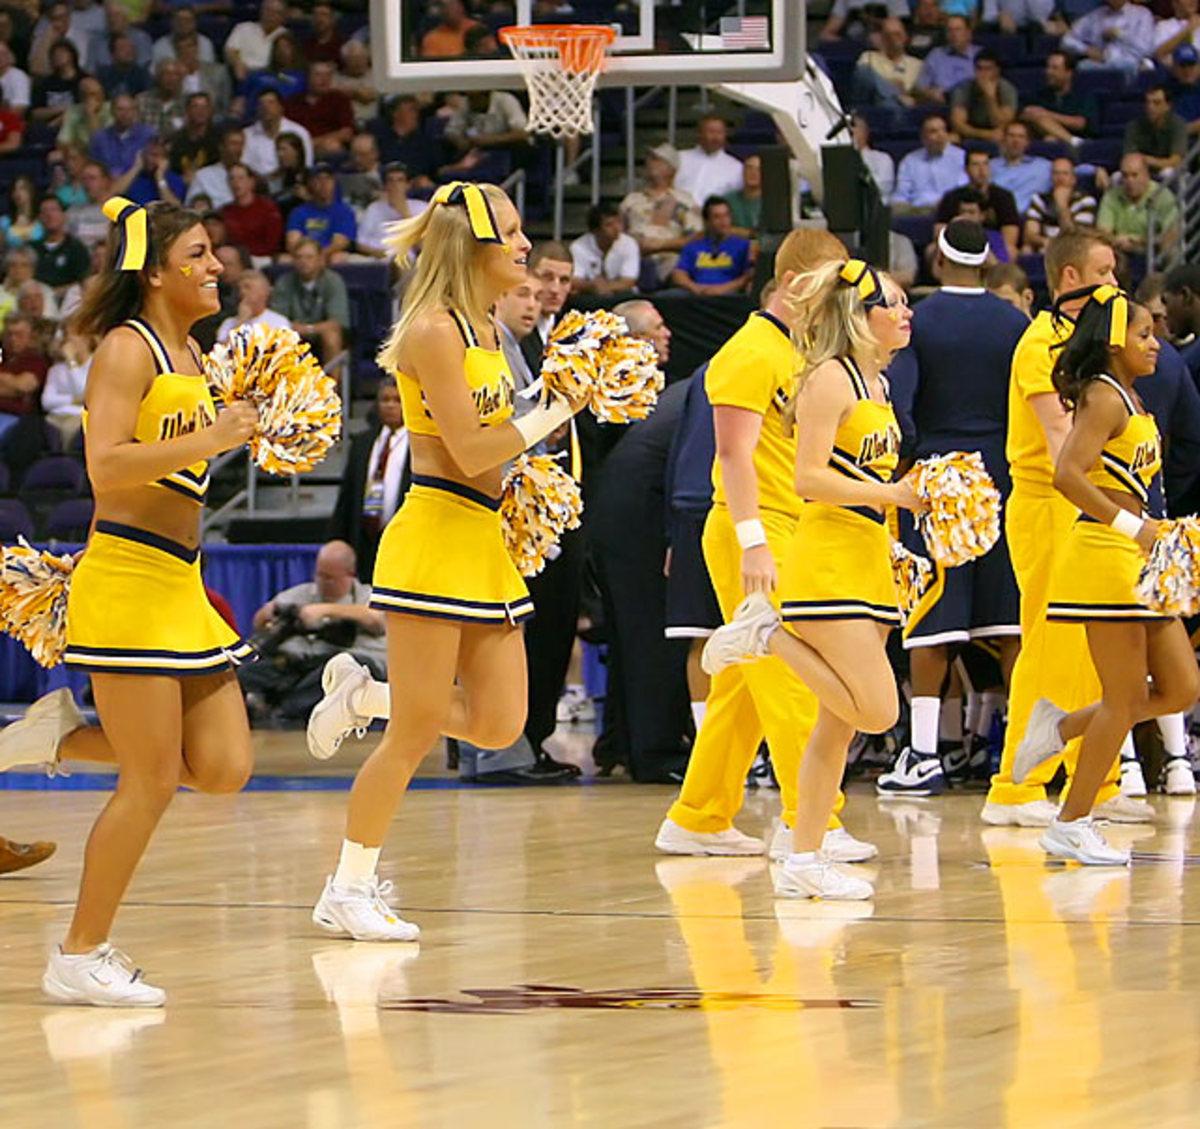 cheerleader.YP4X5157.jpg